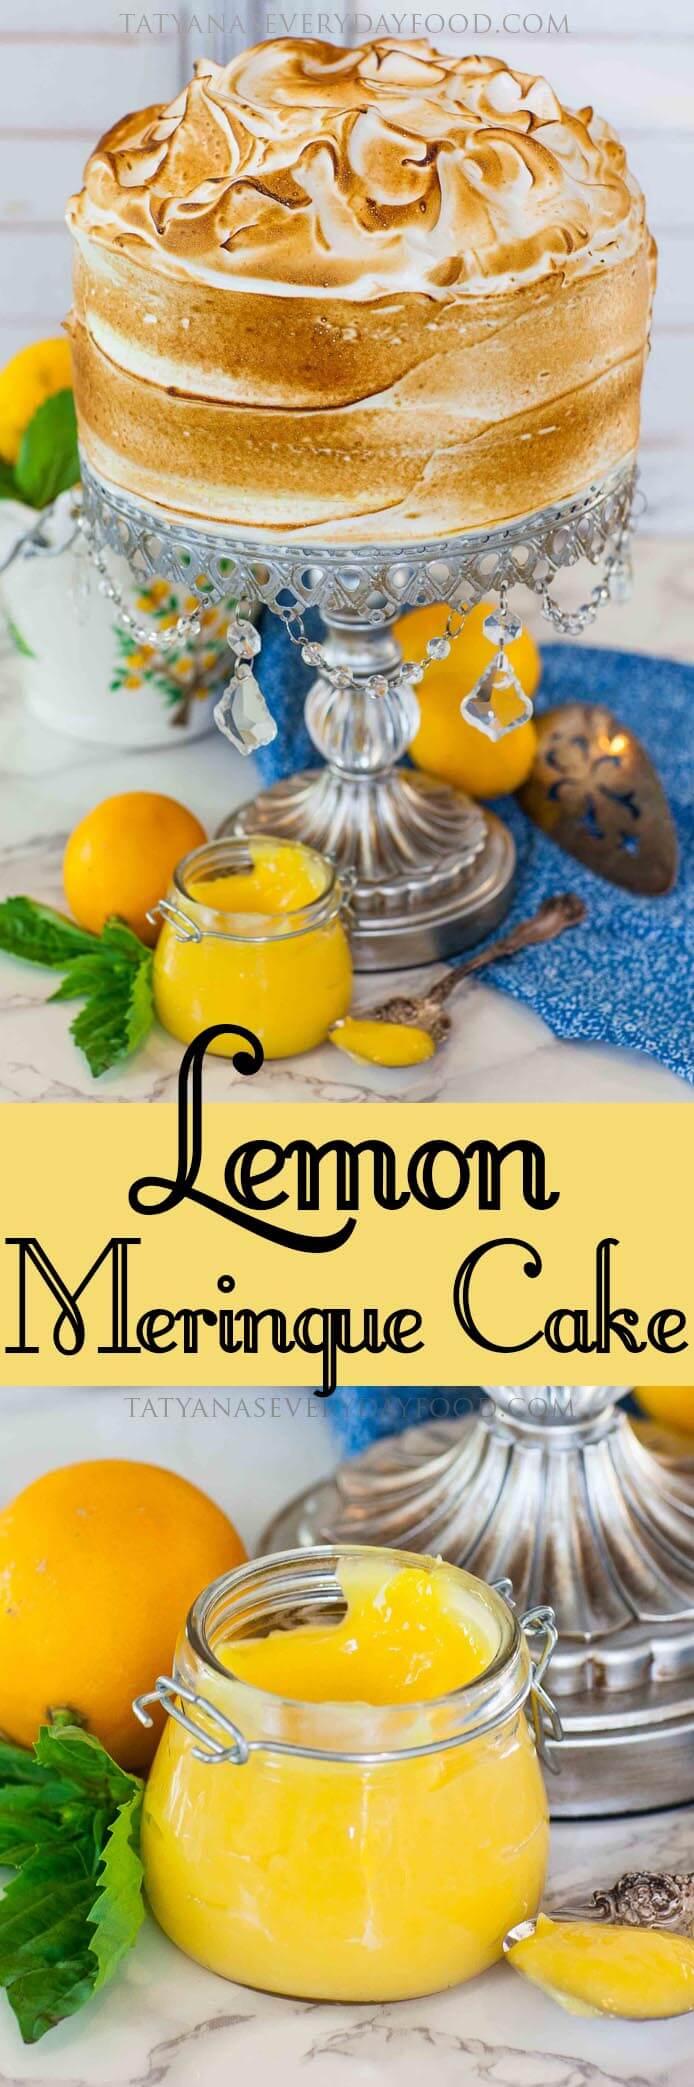 Lemon Meringue Cake with video recipe